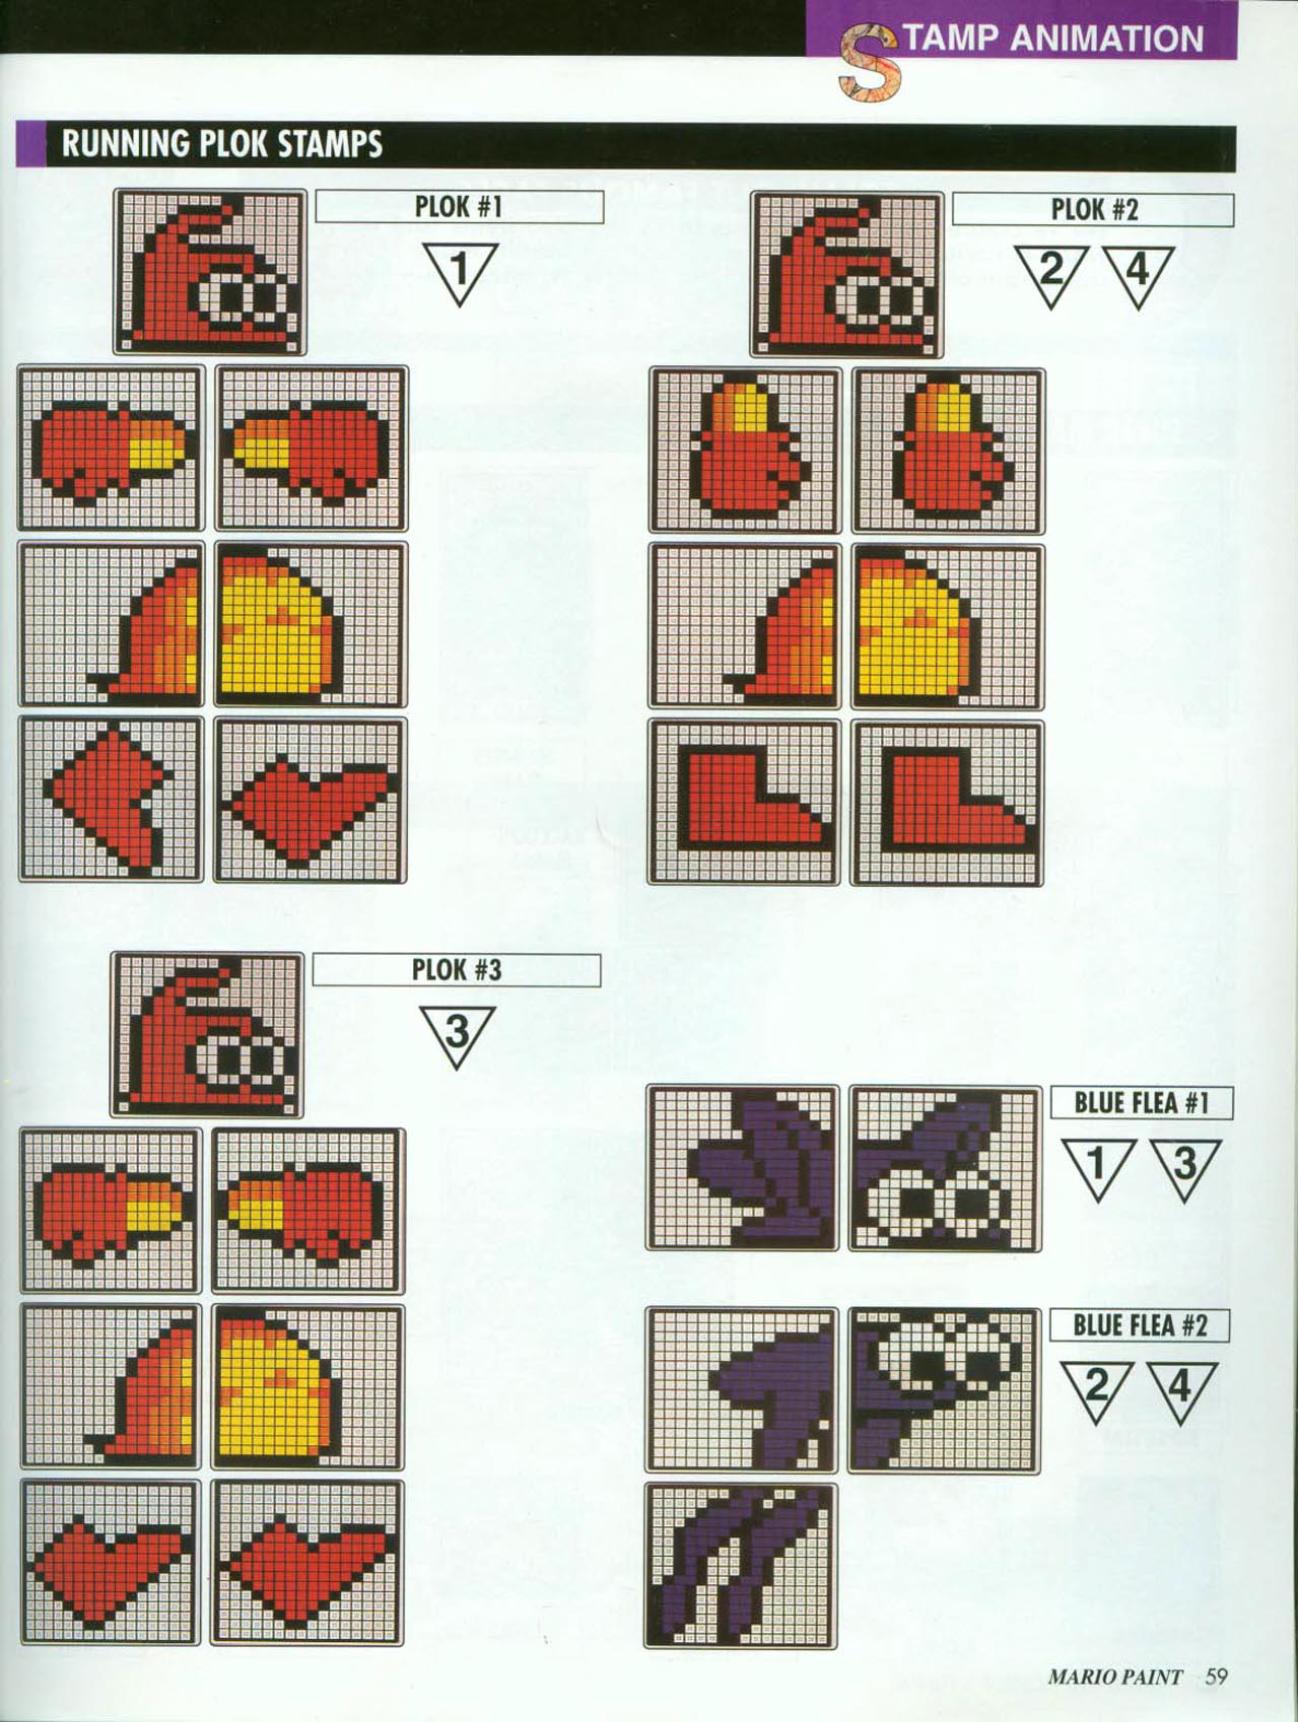 image - mario paint nintendo players guide 59 | plok! wiki